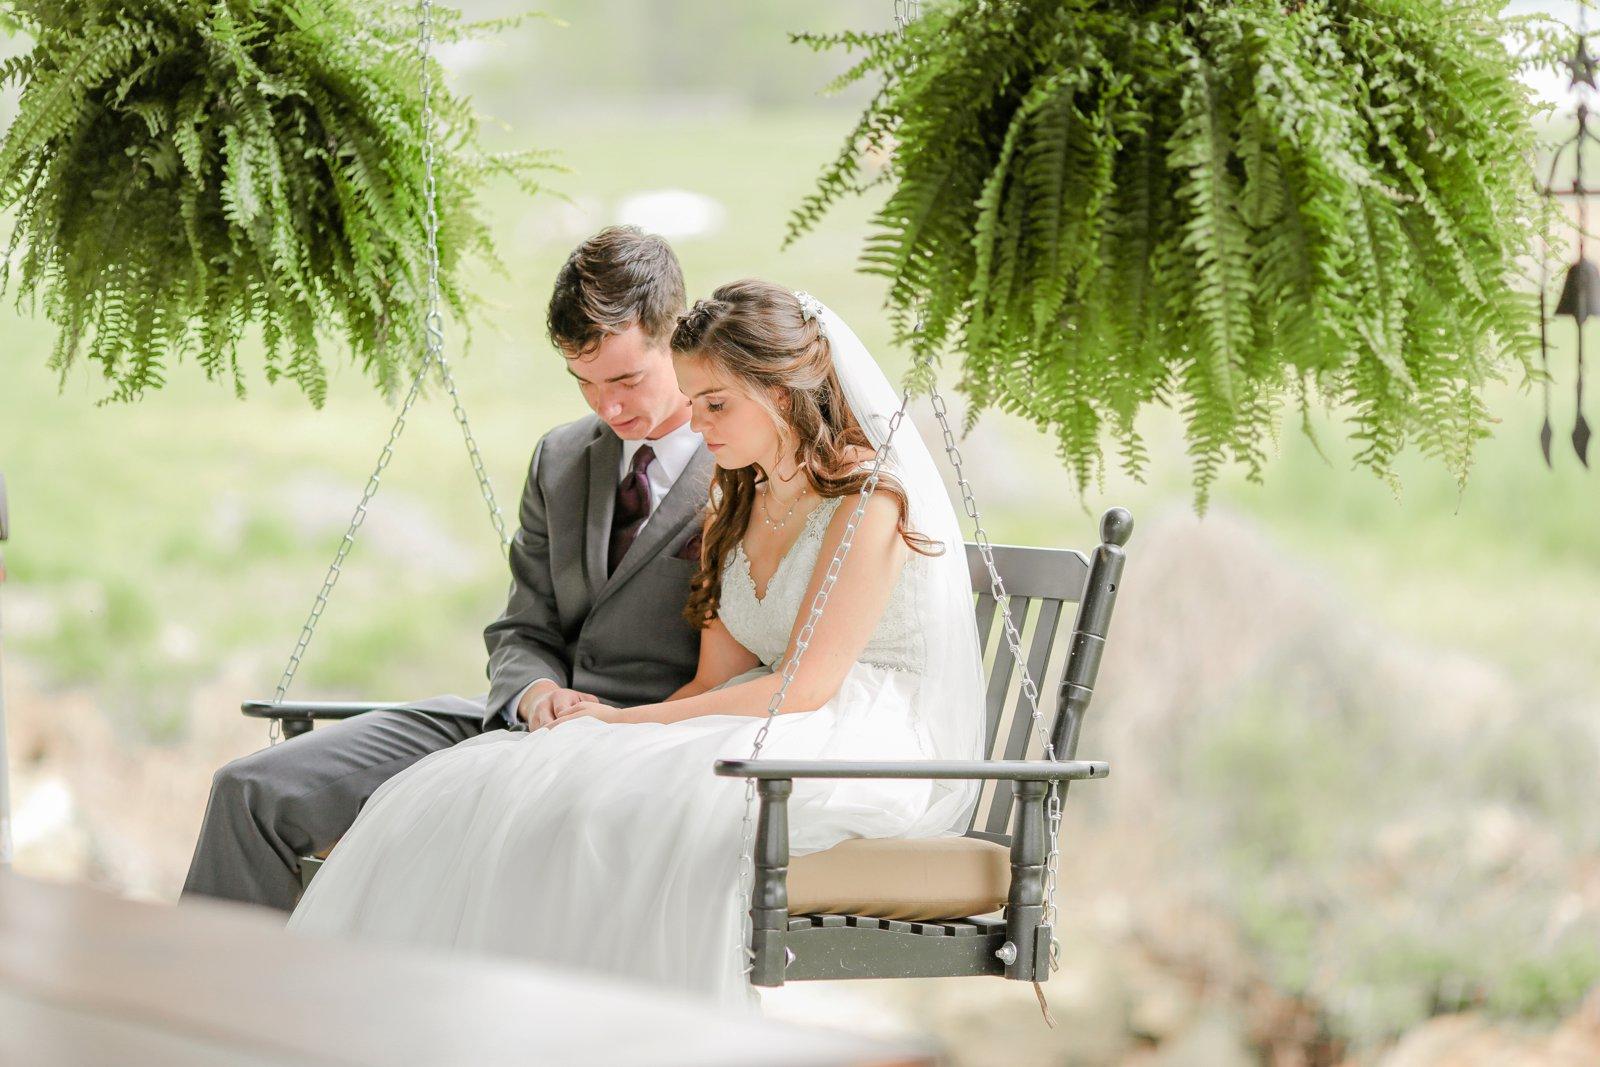 wedding_photographer_Missouri_Destination_elope_intimate_Saint_James_MO_Missouri_KansasCity_Jeff_City_Jefferson_Columbia_Engagement_Photos_Pictures_Session_Best_Videographer_0203.jpg